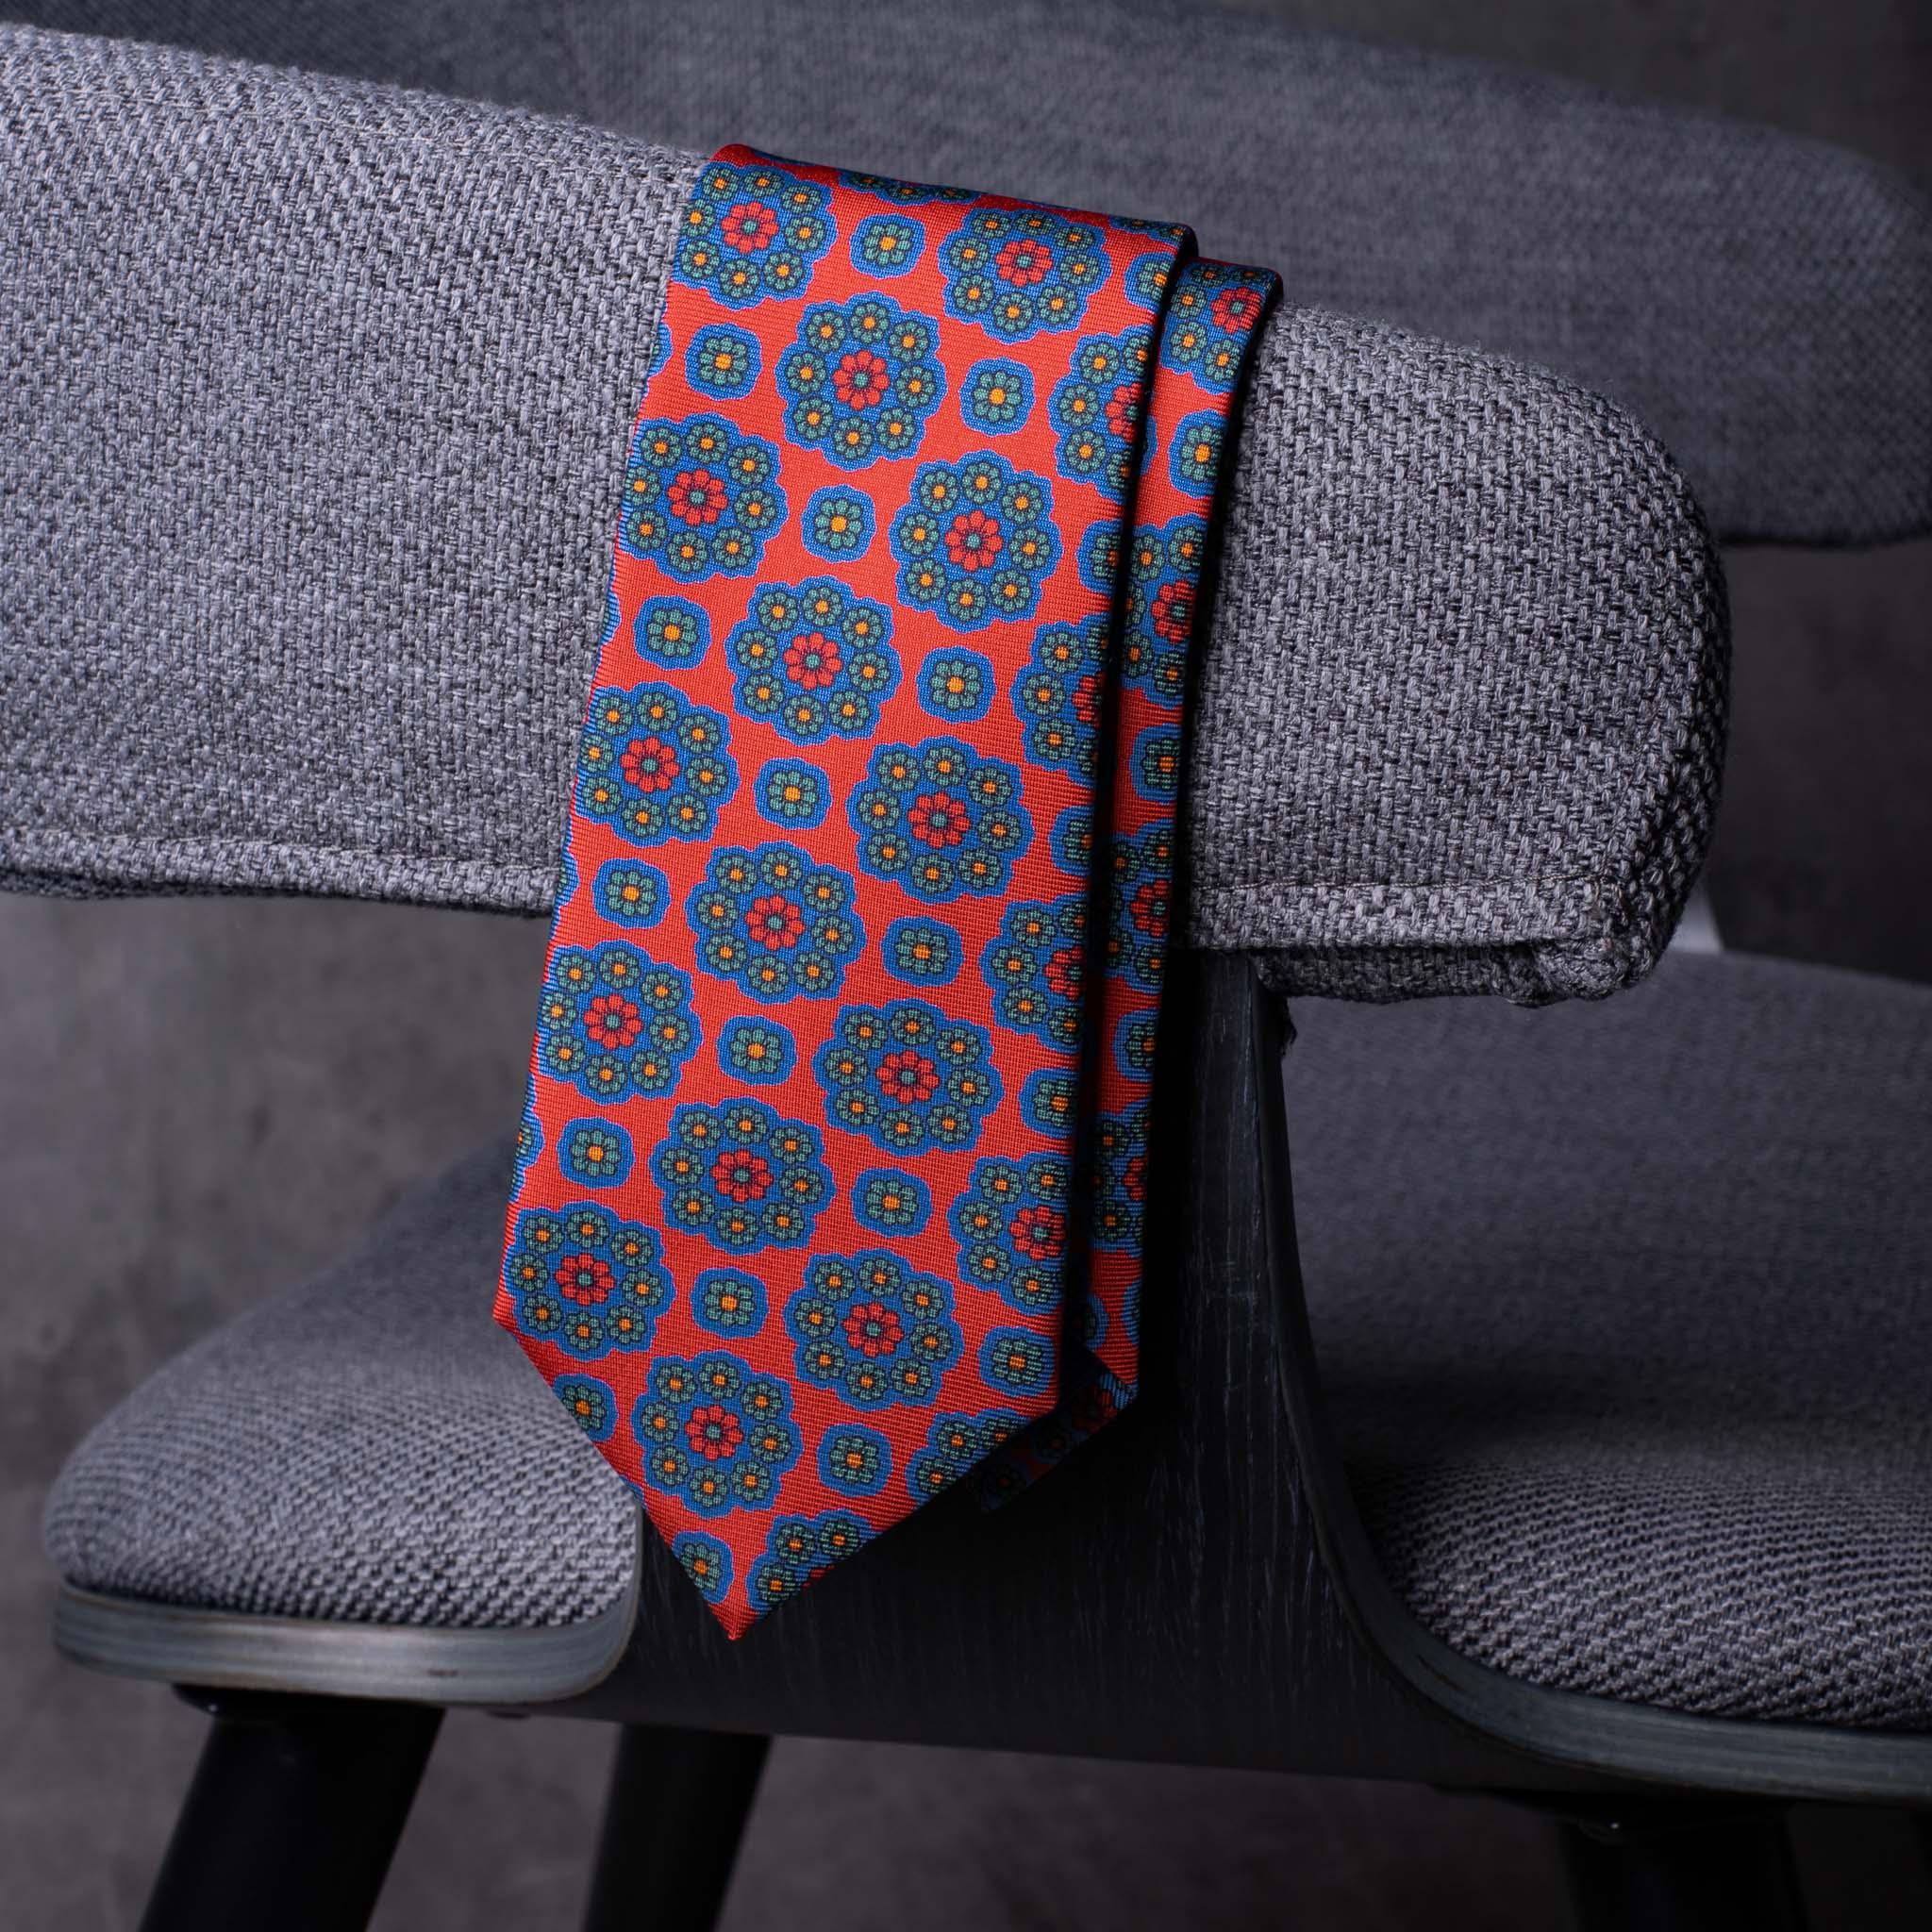 PRINTED SILK-0245-Tie-Initials-Corbata-Iniciales-The-Seelk-3